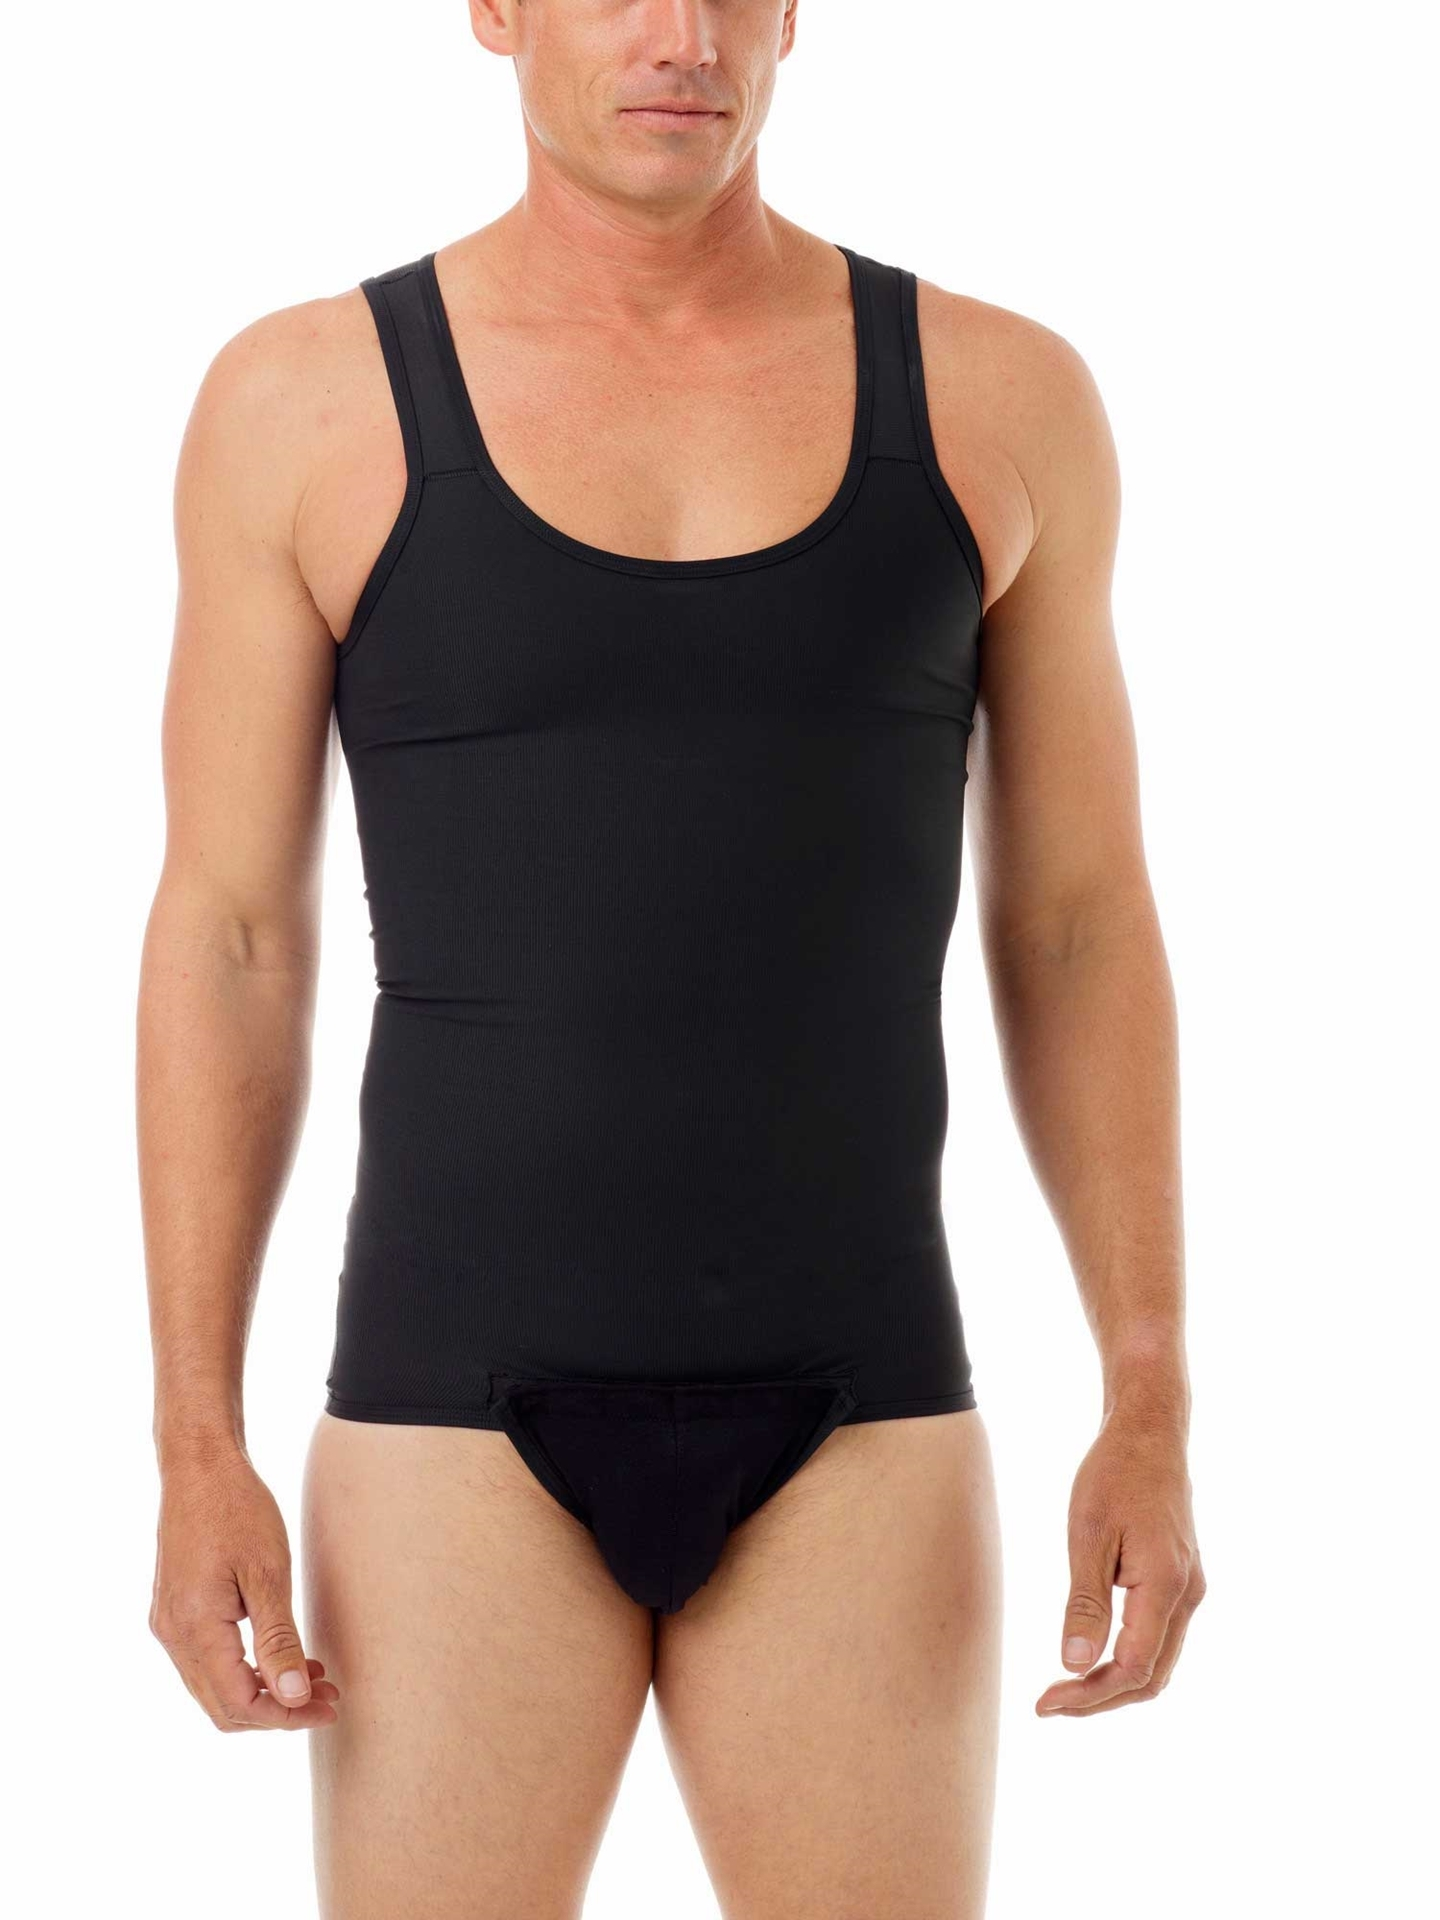 Black Compression Gynecomastia Tanksuit for men